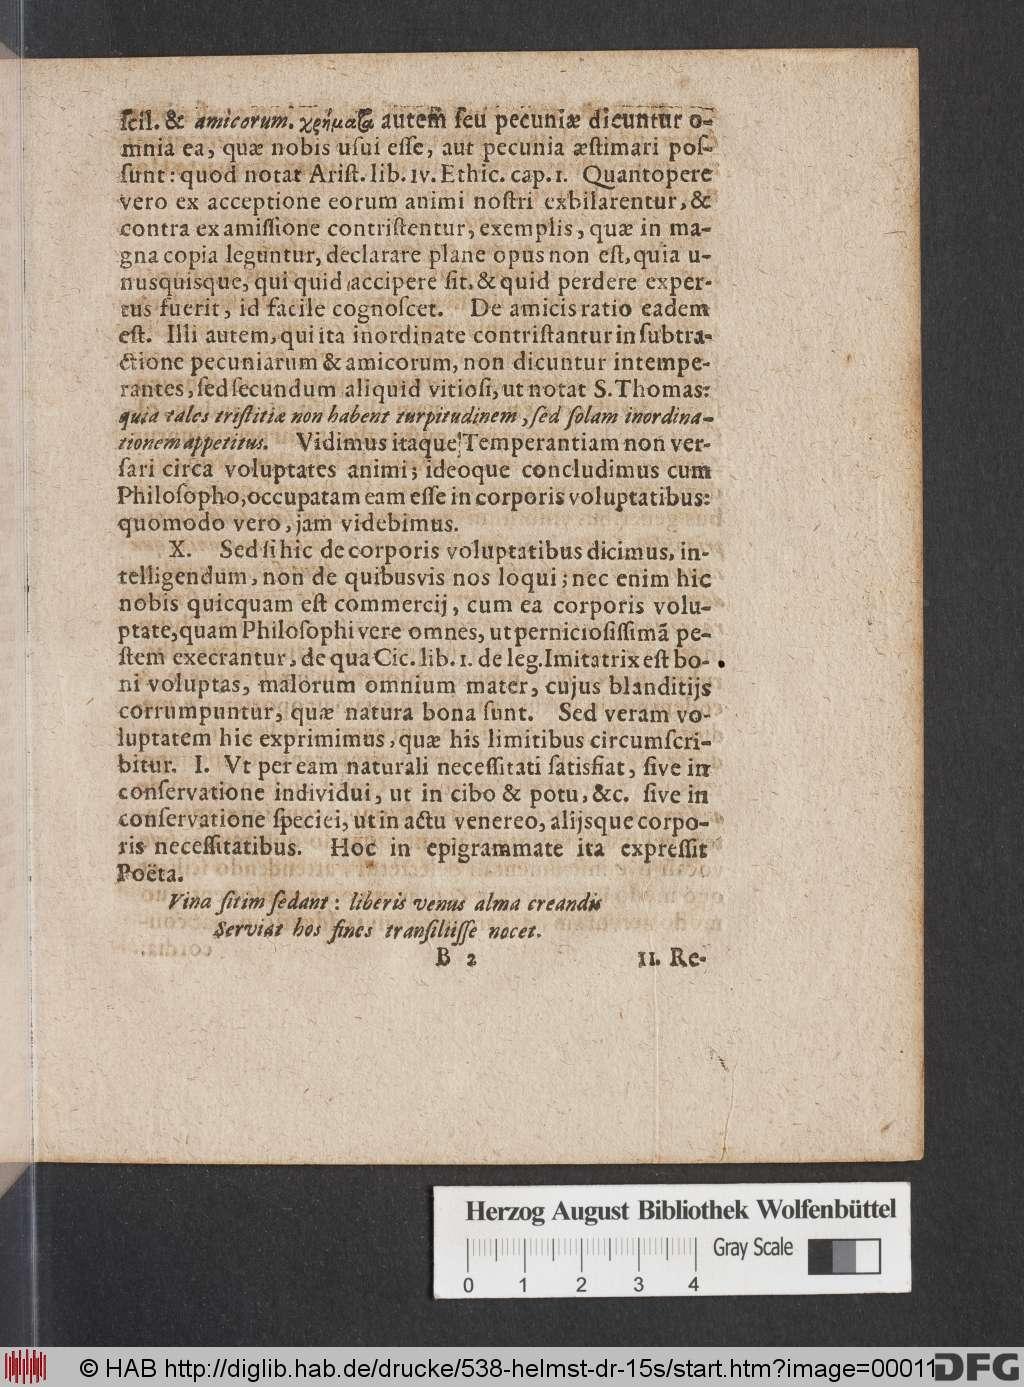 https://diglib.hab.de/drucke/538-helmst-dr-15s/00011.jpg